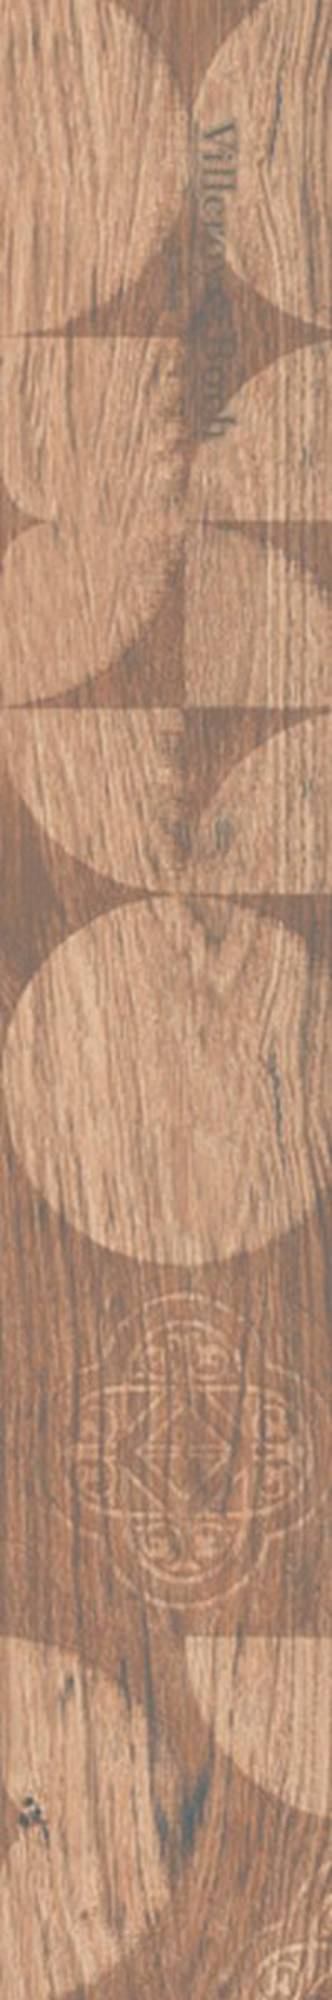 Villeroy & boch Lodge decorstrook 20 x 120 cm. doos a 4 stuks, beige